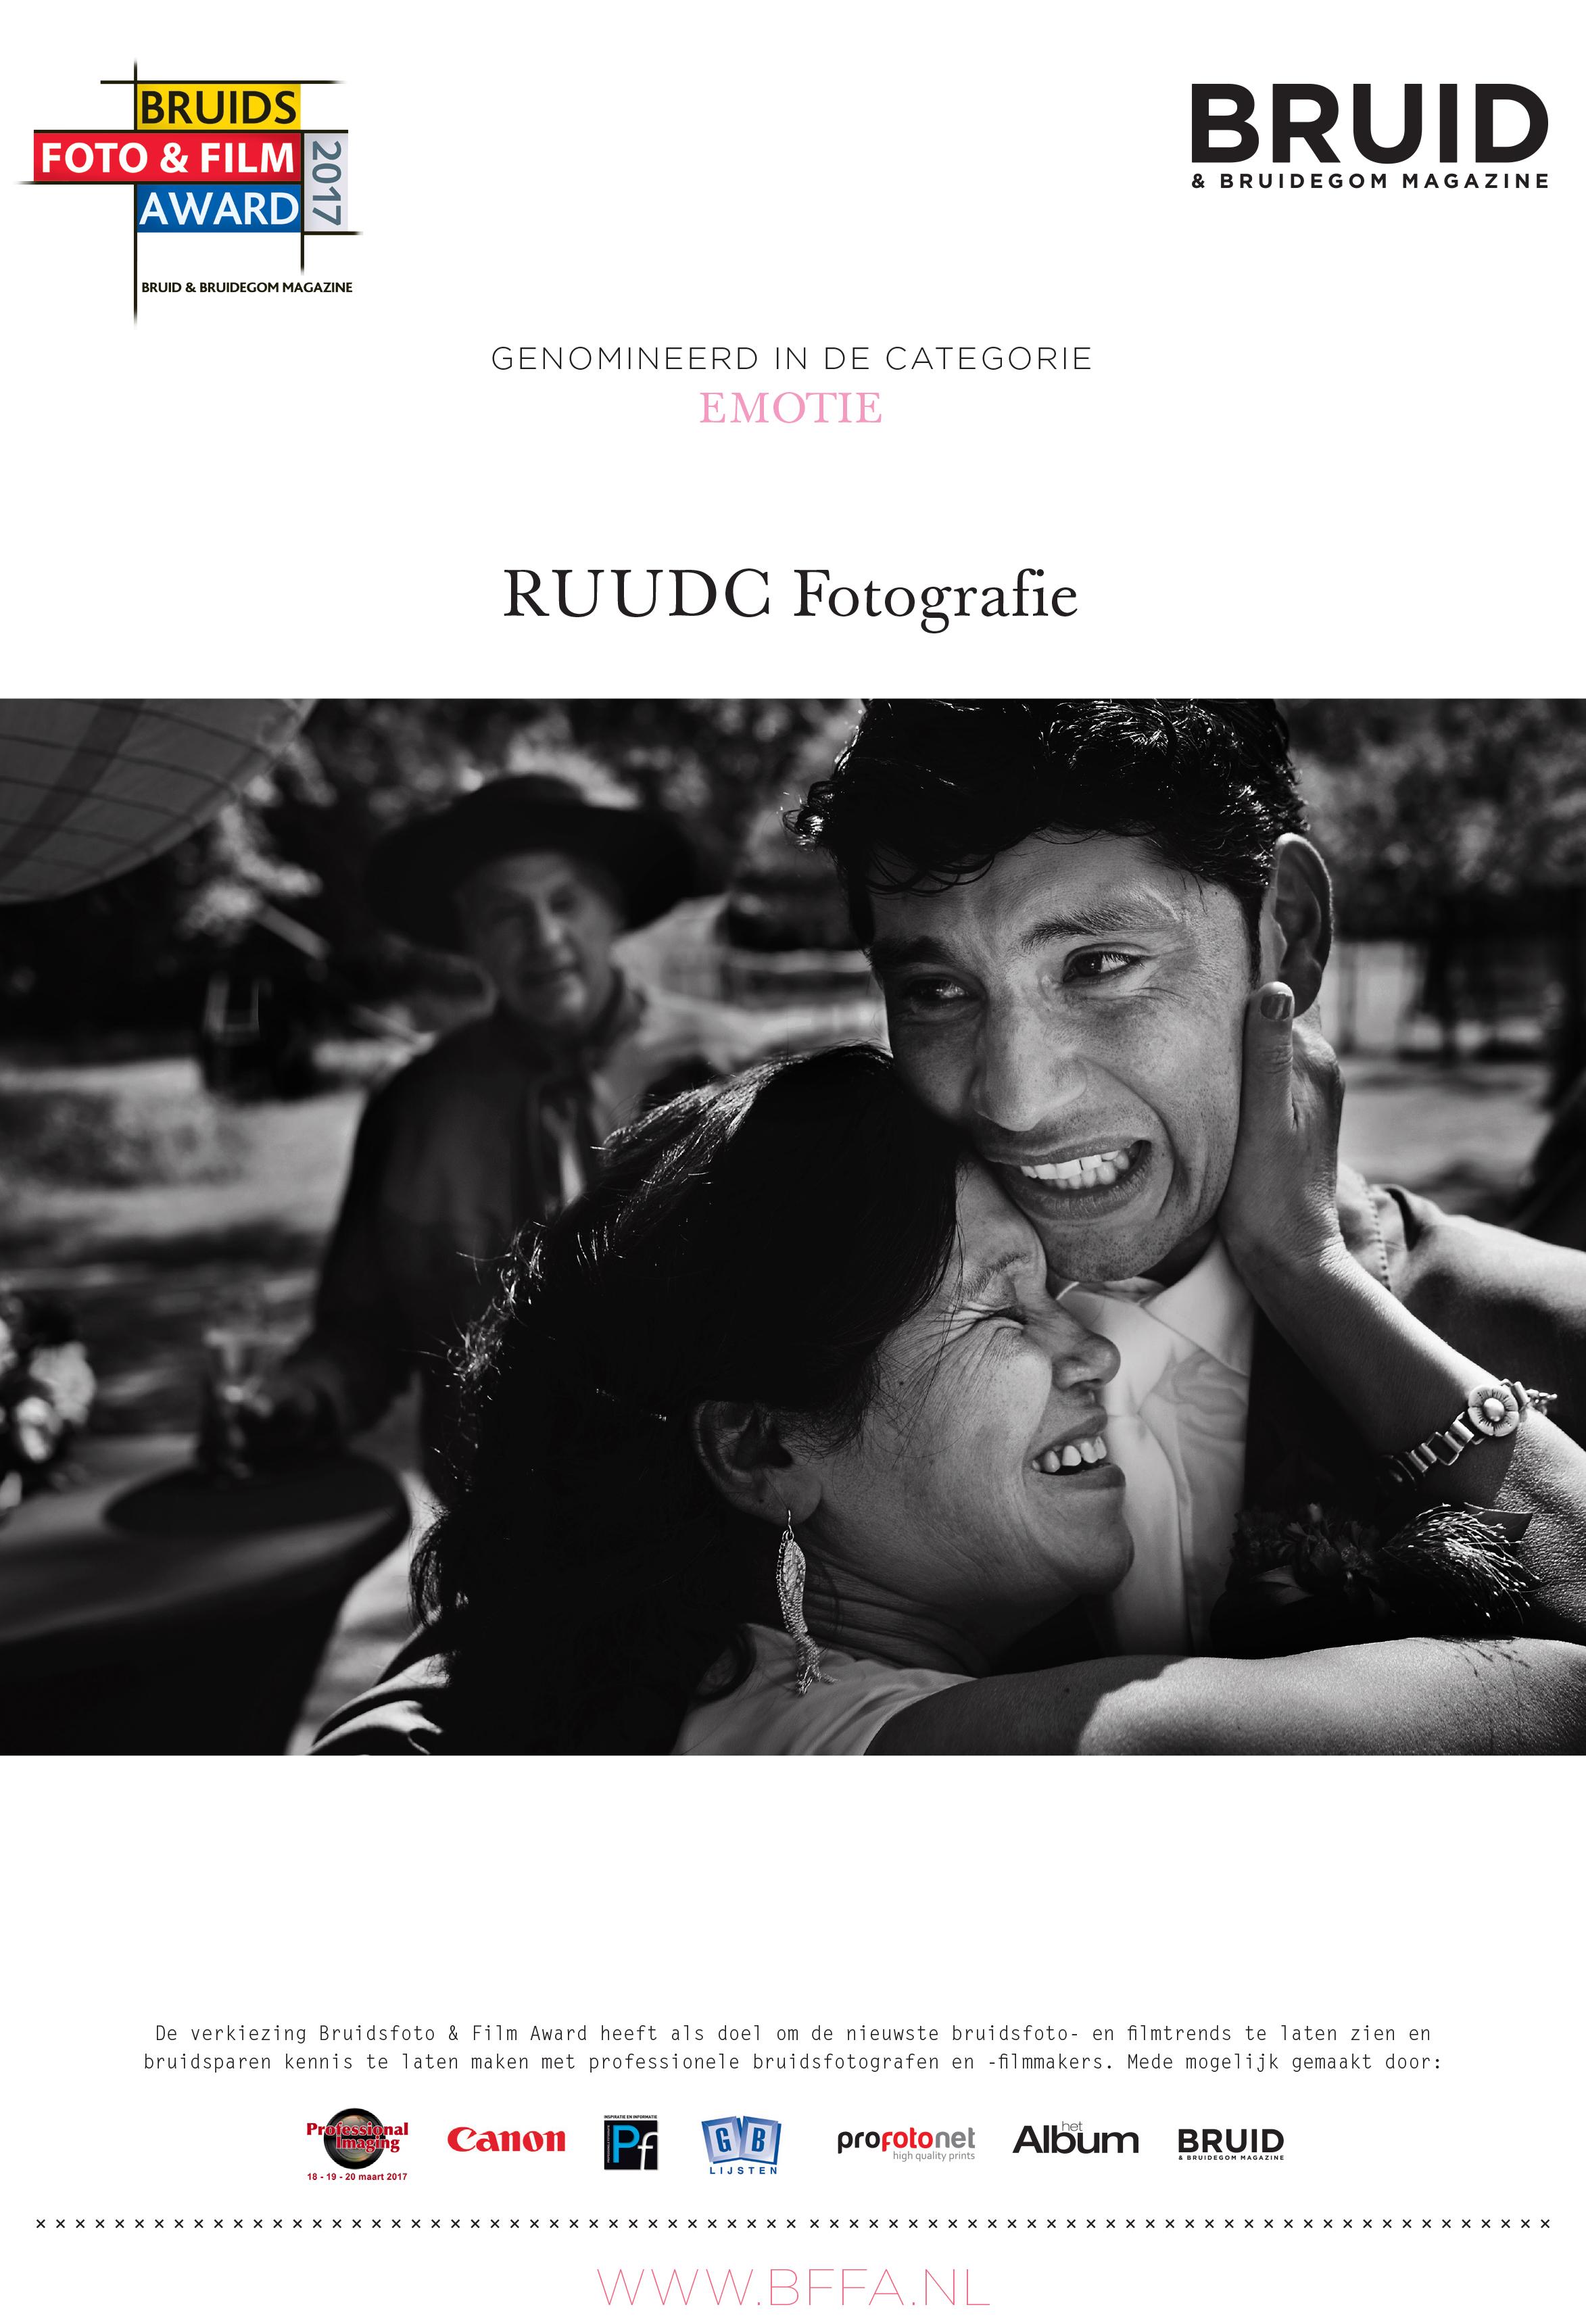 RUUDC Fotografie, RUUDC, BFFA oorkonde 2017 Emotie__RUUDC bruidsfoto award, bruidsfotografie award, bffa, bfa, ruudc, fearless award, masters, masters of dutch wedding photography, trouwfotografie prijs, bruidsfotograaf, bruidsfotografie, roermond, limburg, nederland, hip, trendy, romantiek, romantisch, journalistiek, documentair, bohemian, tarieven, trouwfotograaf, trouwfotografie, bruidsreportage, bruidsreportages, fotograaf bruiloft, fotograaf bruiloften, bruidsfotograaf, bruidsfotografie, hip, trendy, romantiek, journalistiek, bohemian, tarieven, kosten, prijs, prijslijst, destination weddings, trouwen in het buitenland, buitenland, wat kost een bruidsfotograaf, trouwfotograaf, trouwfotografie, fotograaf bruiloft, prijzen, destination weddings, destination wedding fotograaf, fotograaf buitenland, trouwen in het buitenland